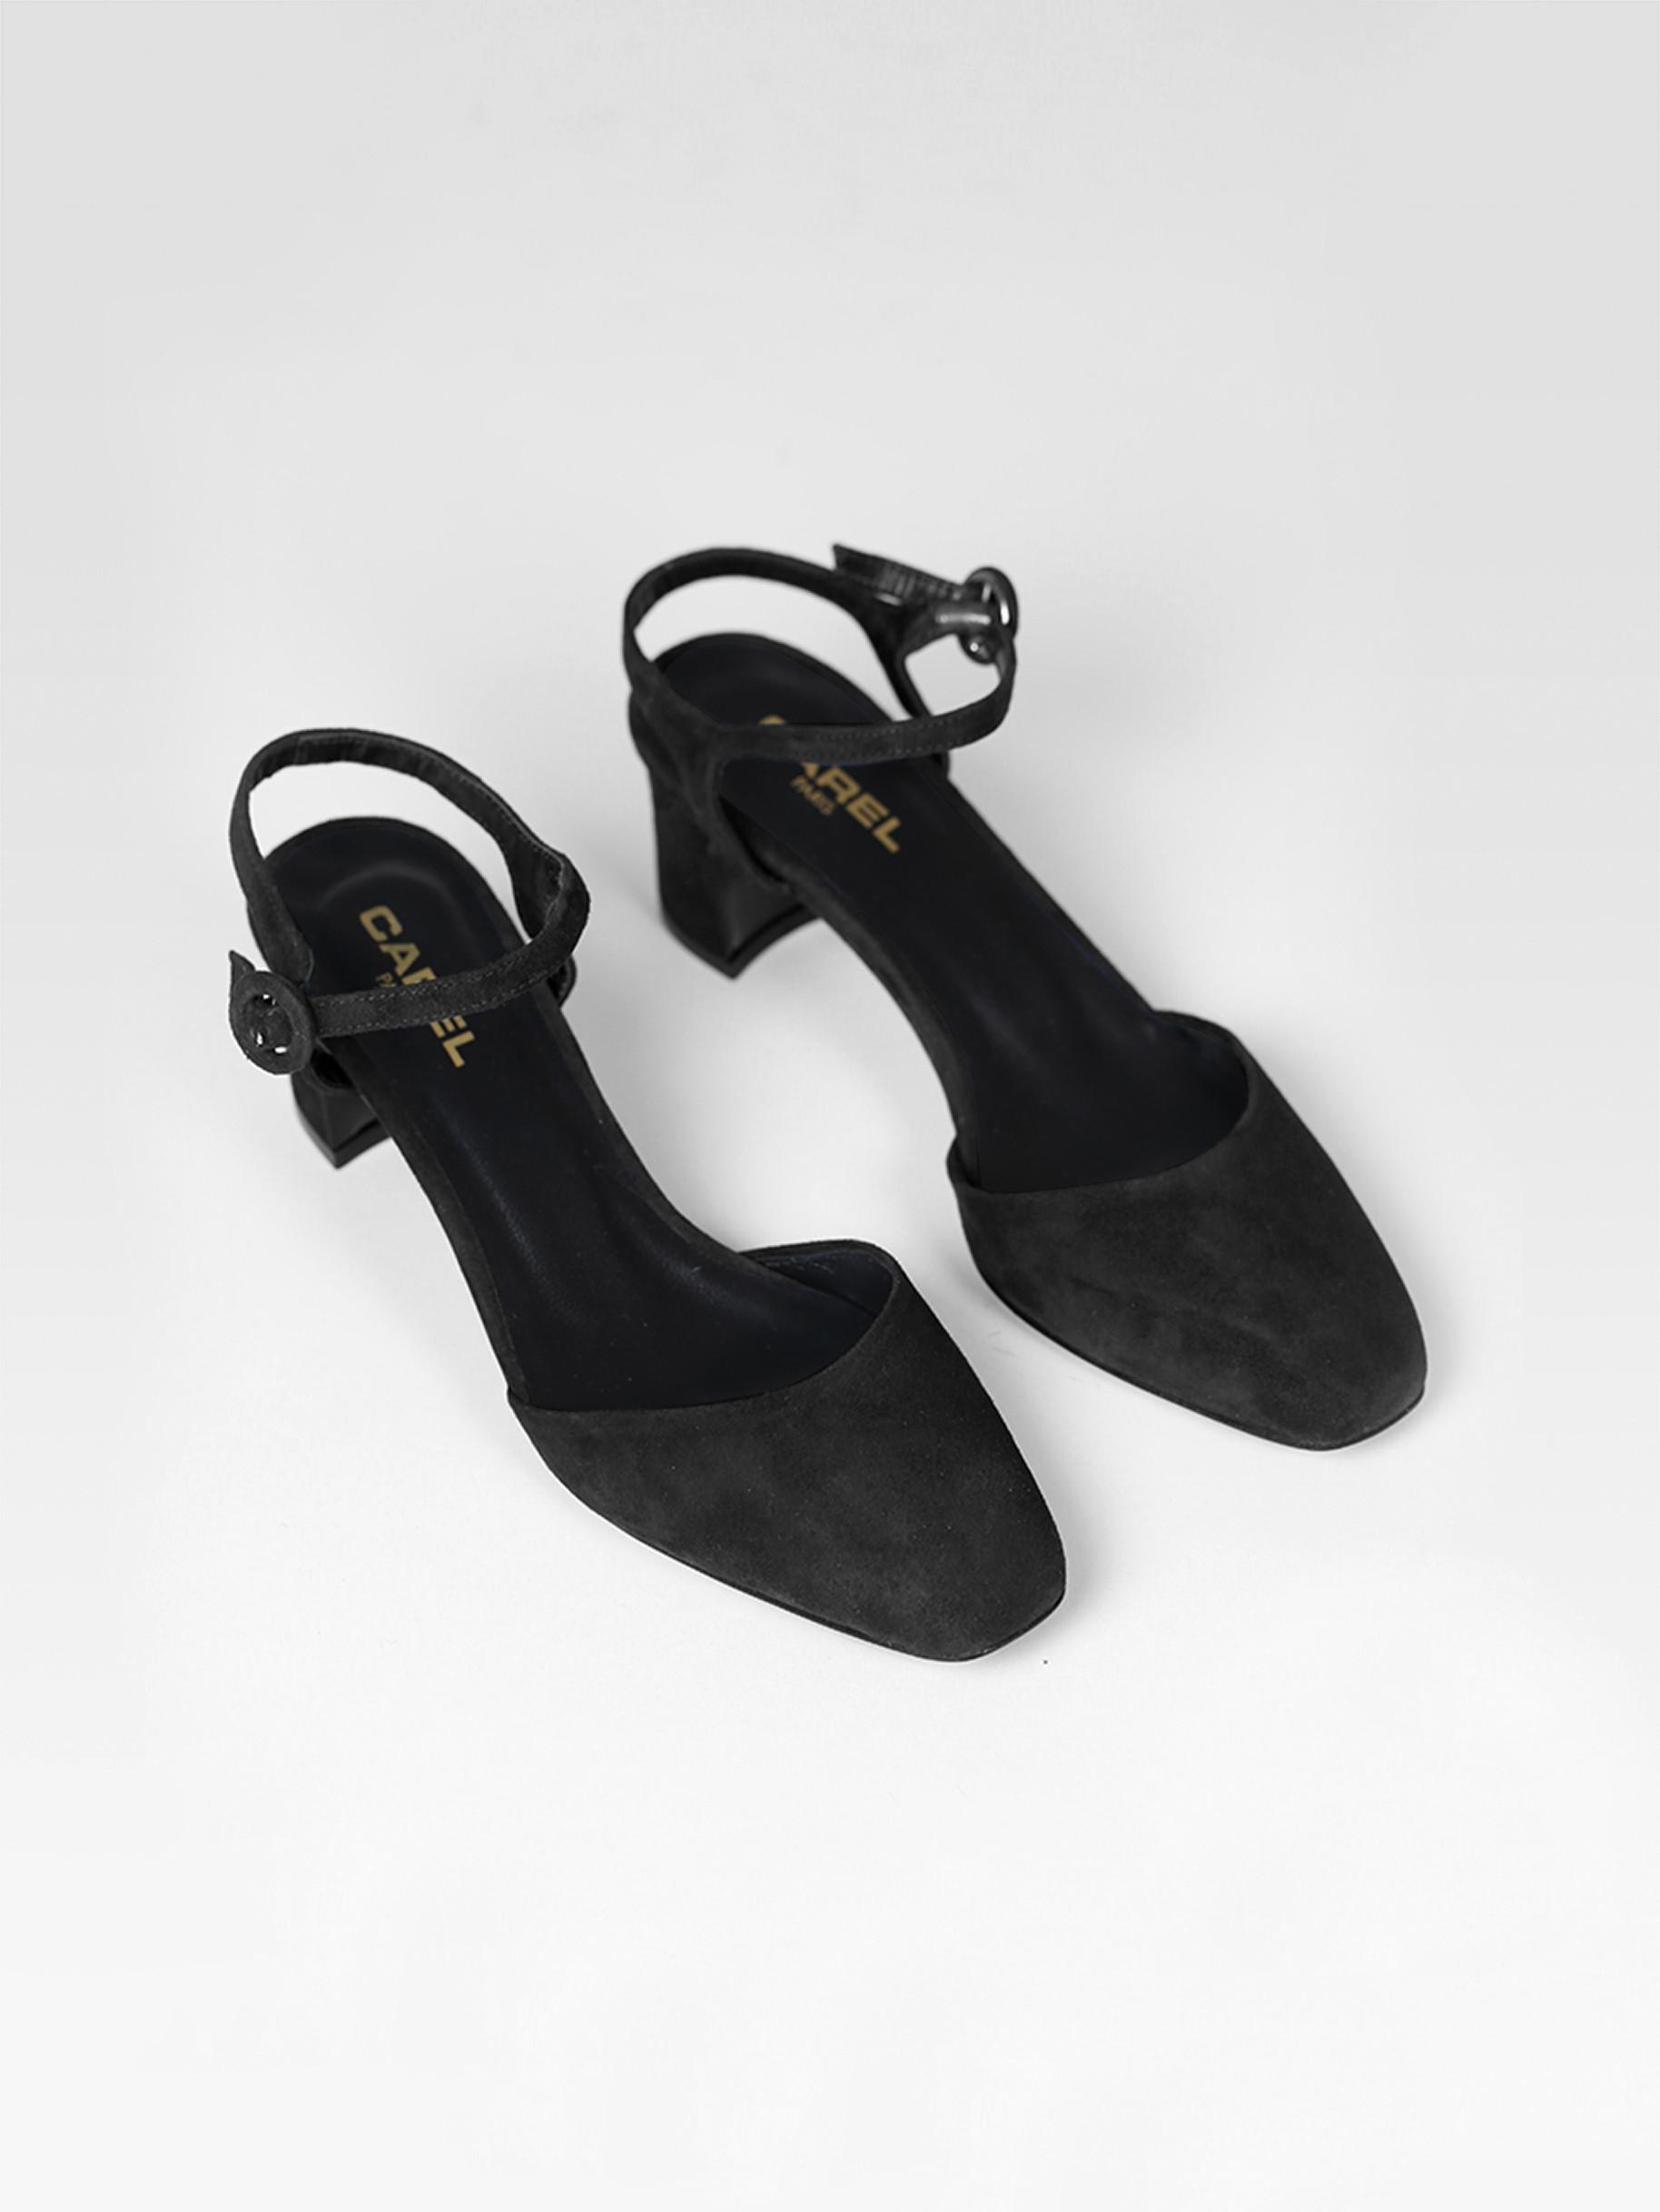 Sandales noir cuir velours cuir noir velours velours Sandales cuir Sandales lKc5uF3J1T